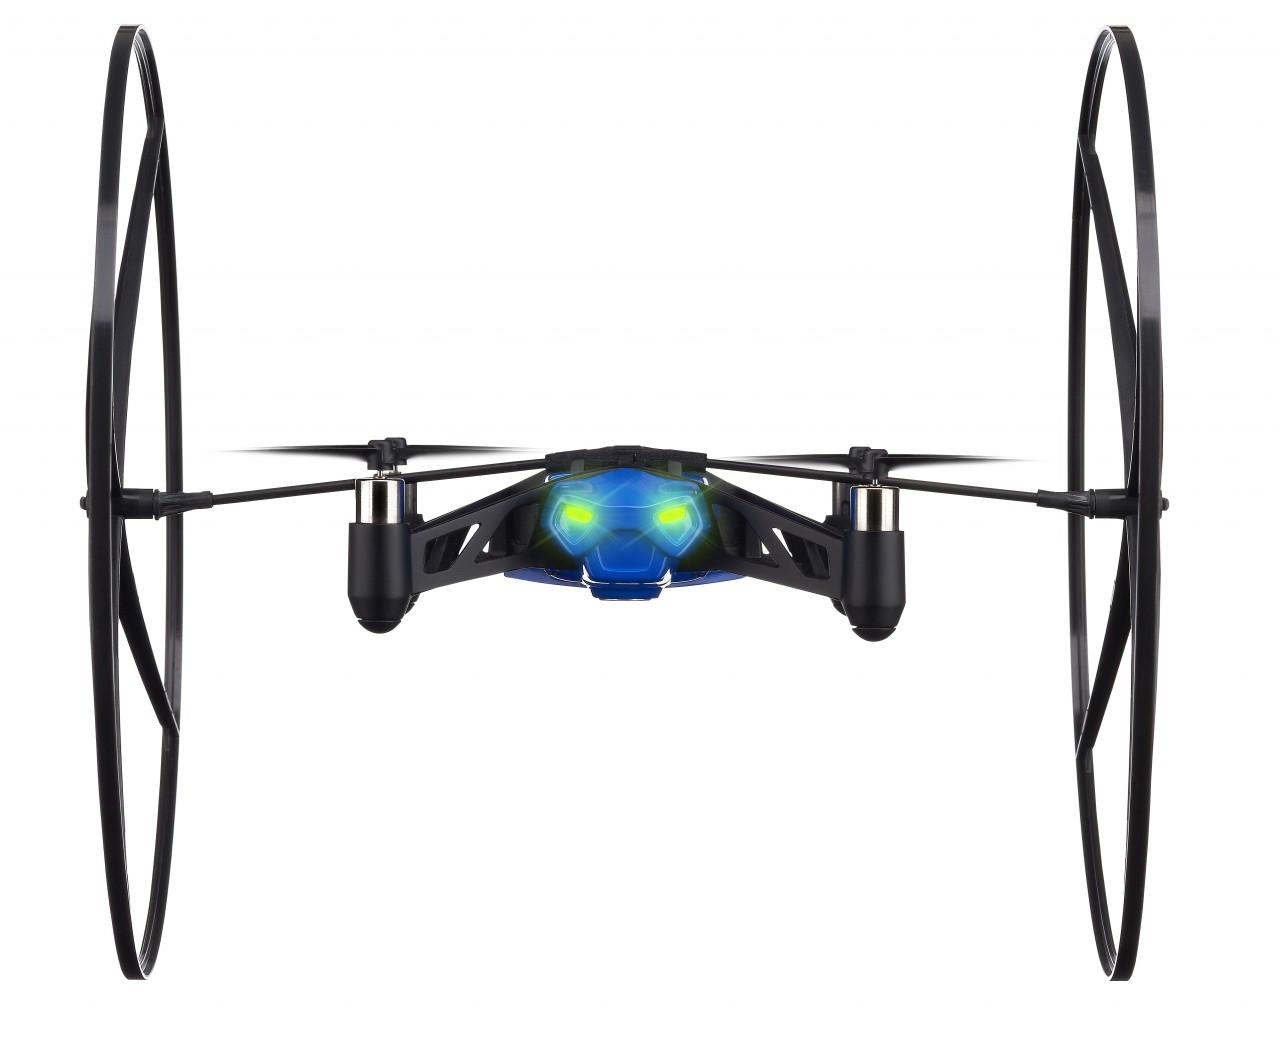 Parrot drone mini